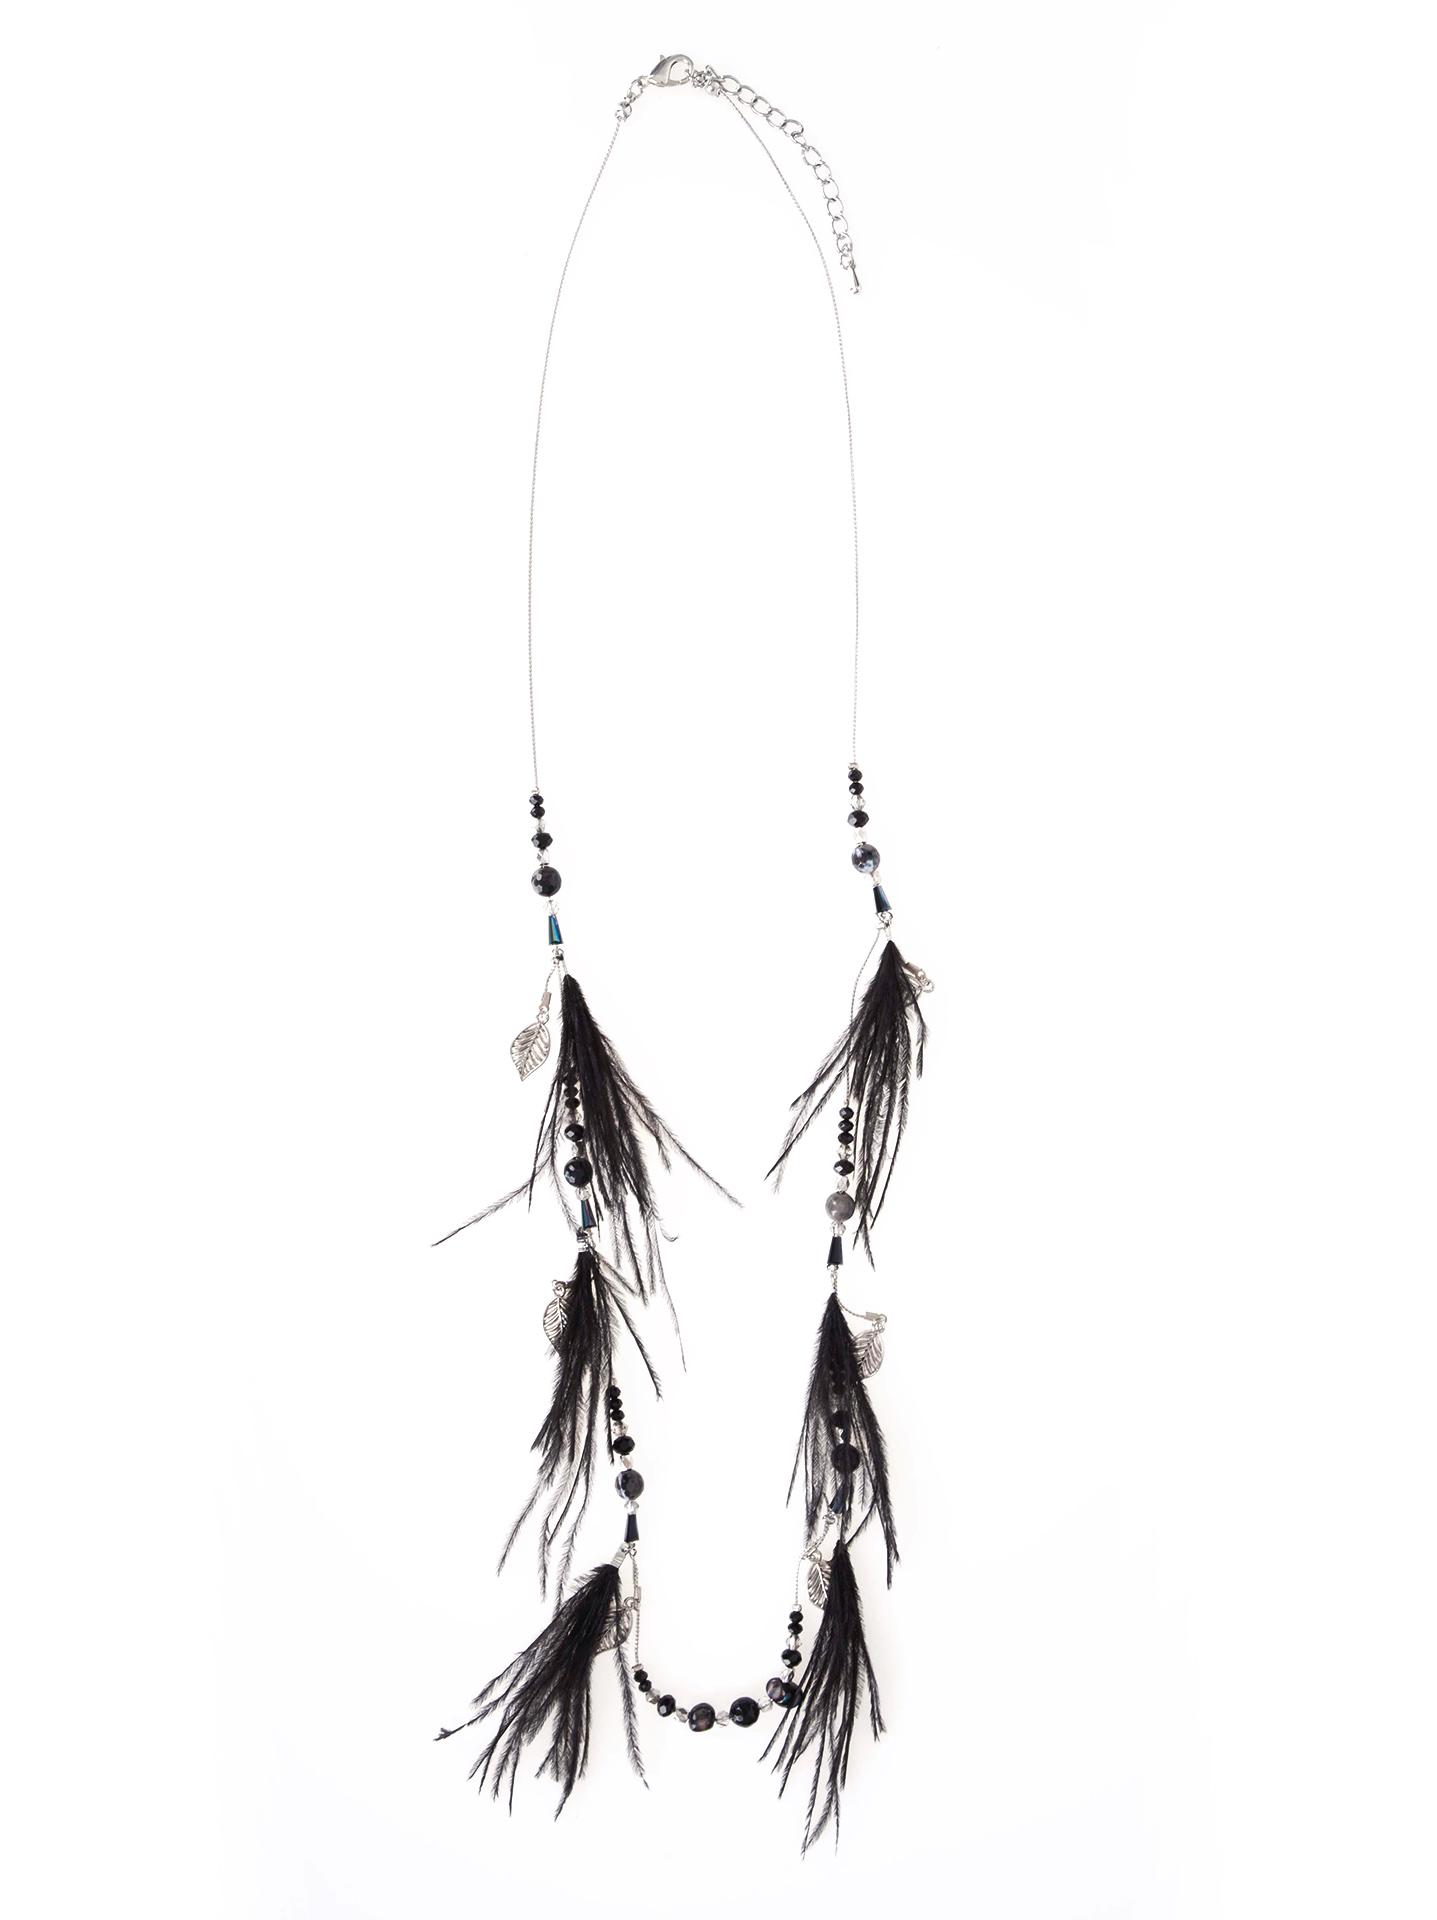 Celestino Μακρύ κολιέ με χάντρες και φτερά WL1615.A503+1 - Glami.gr 119f04f5d37